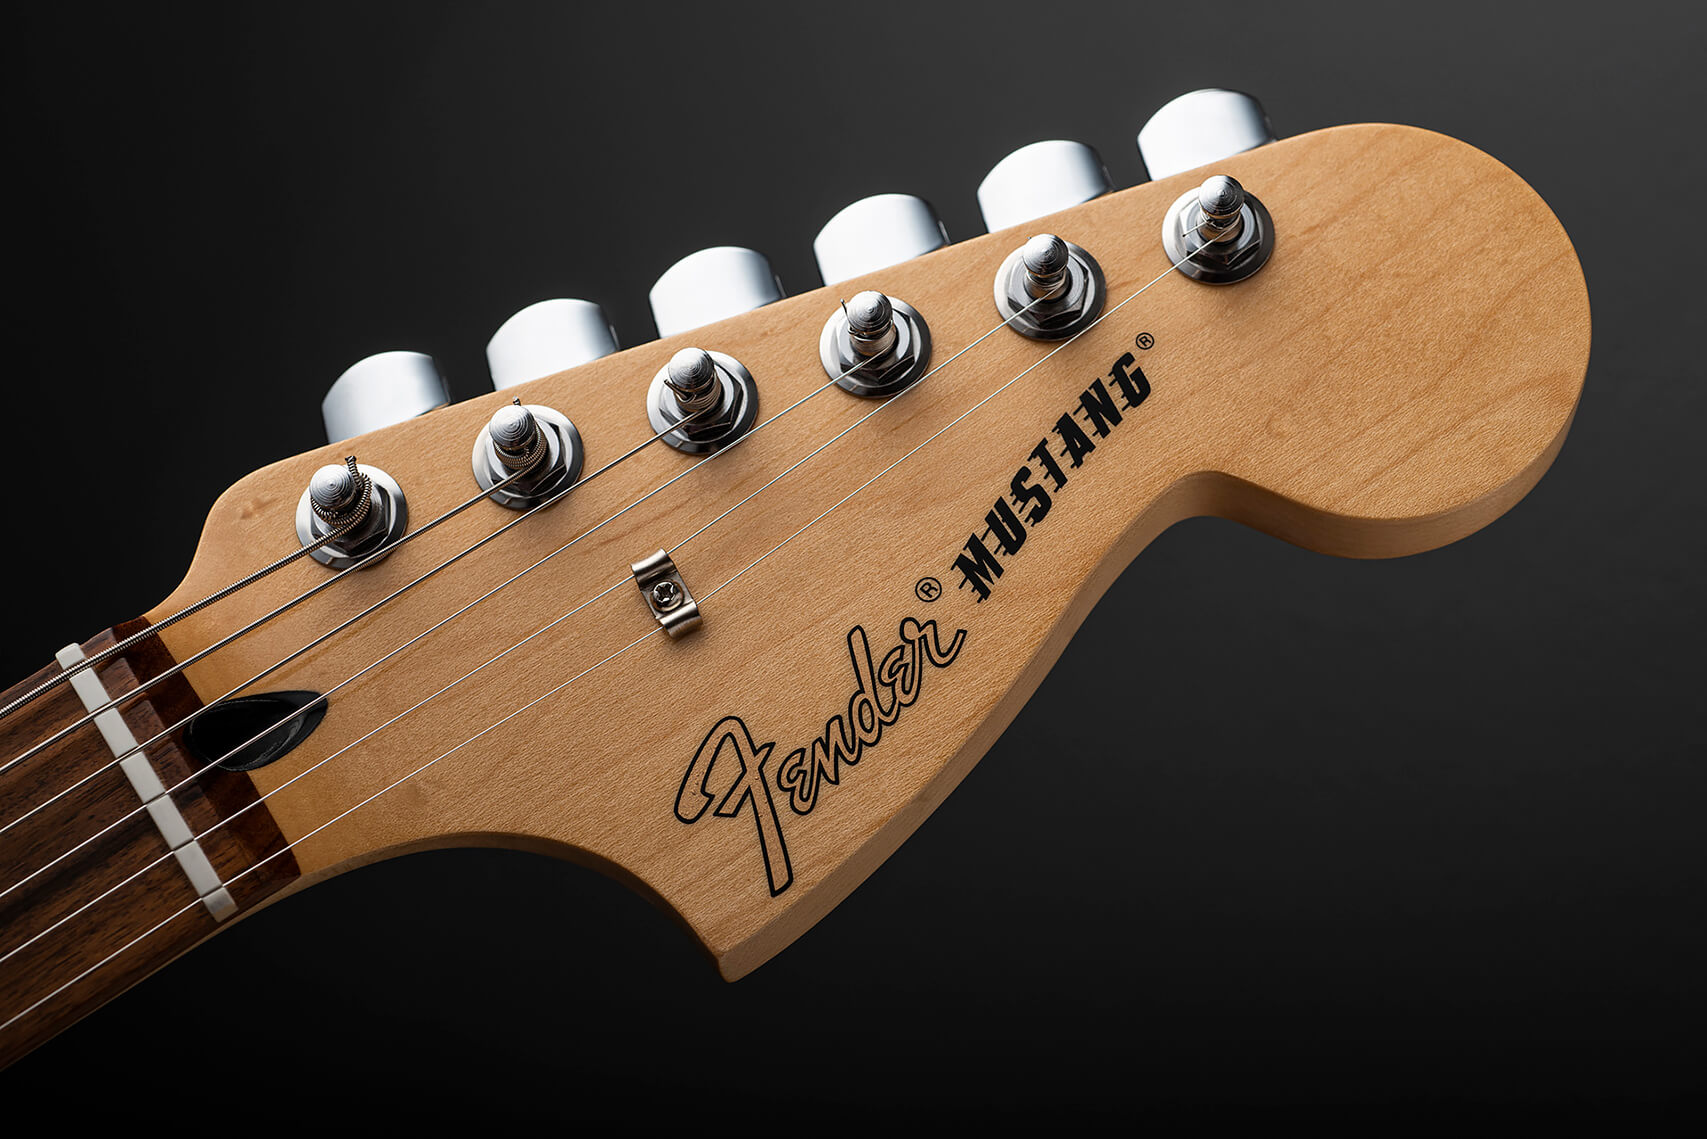 Fender Player Mustang Headstock